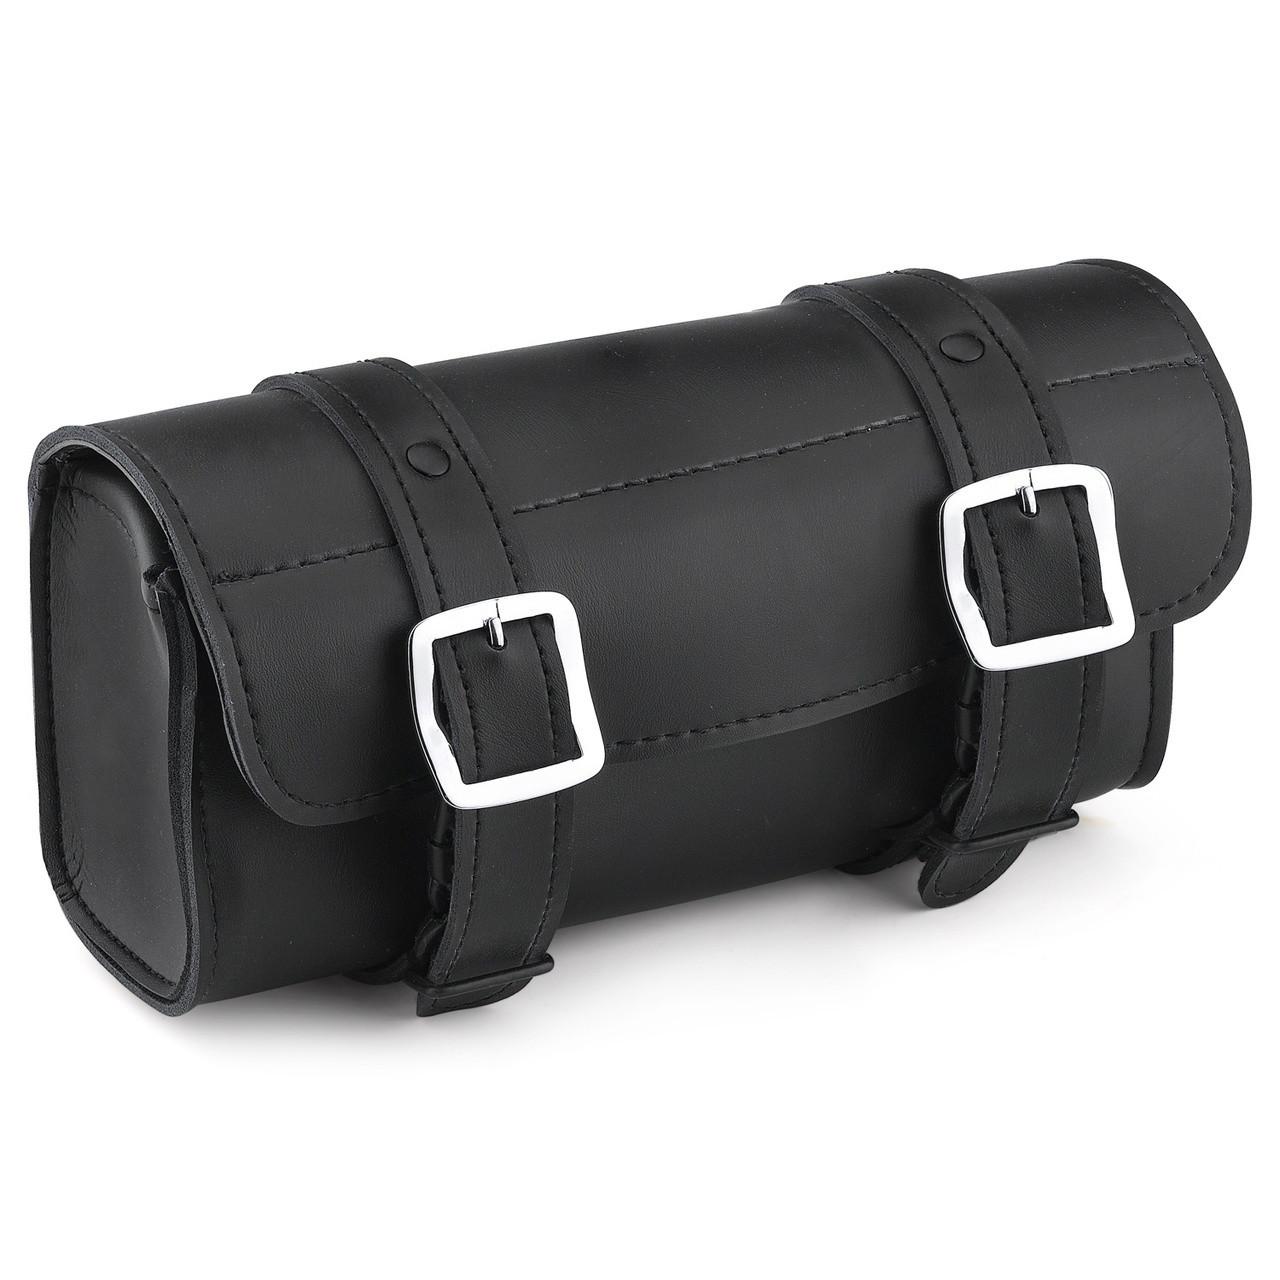 Armor Plain Motorcycle Tool Bag Main Image